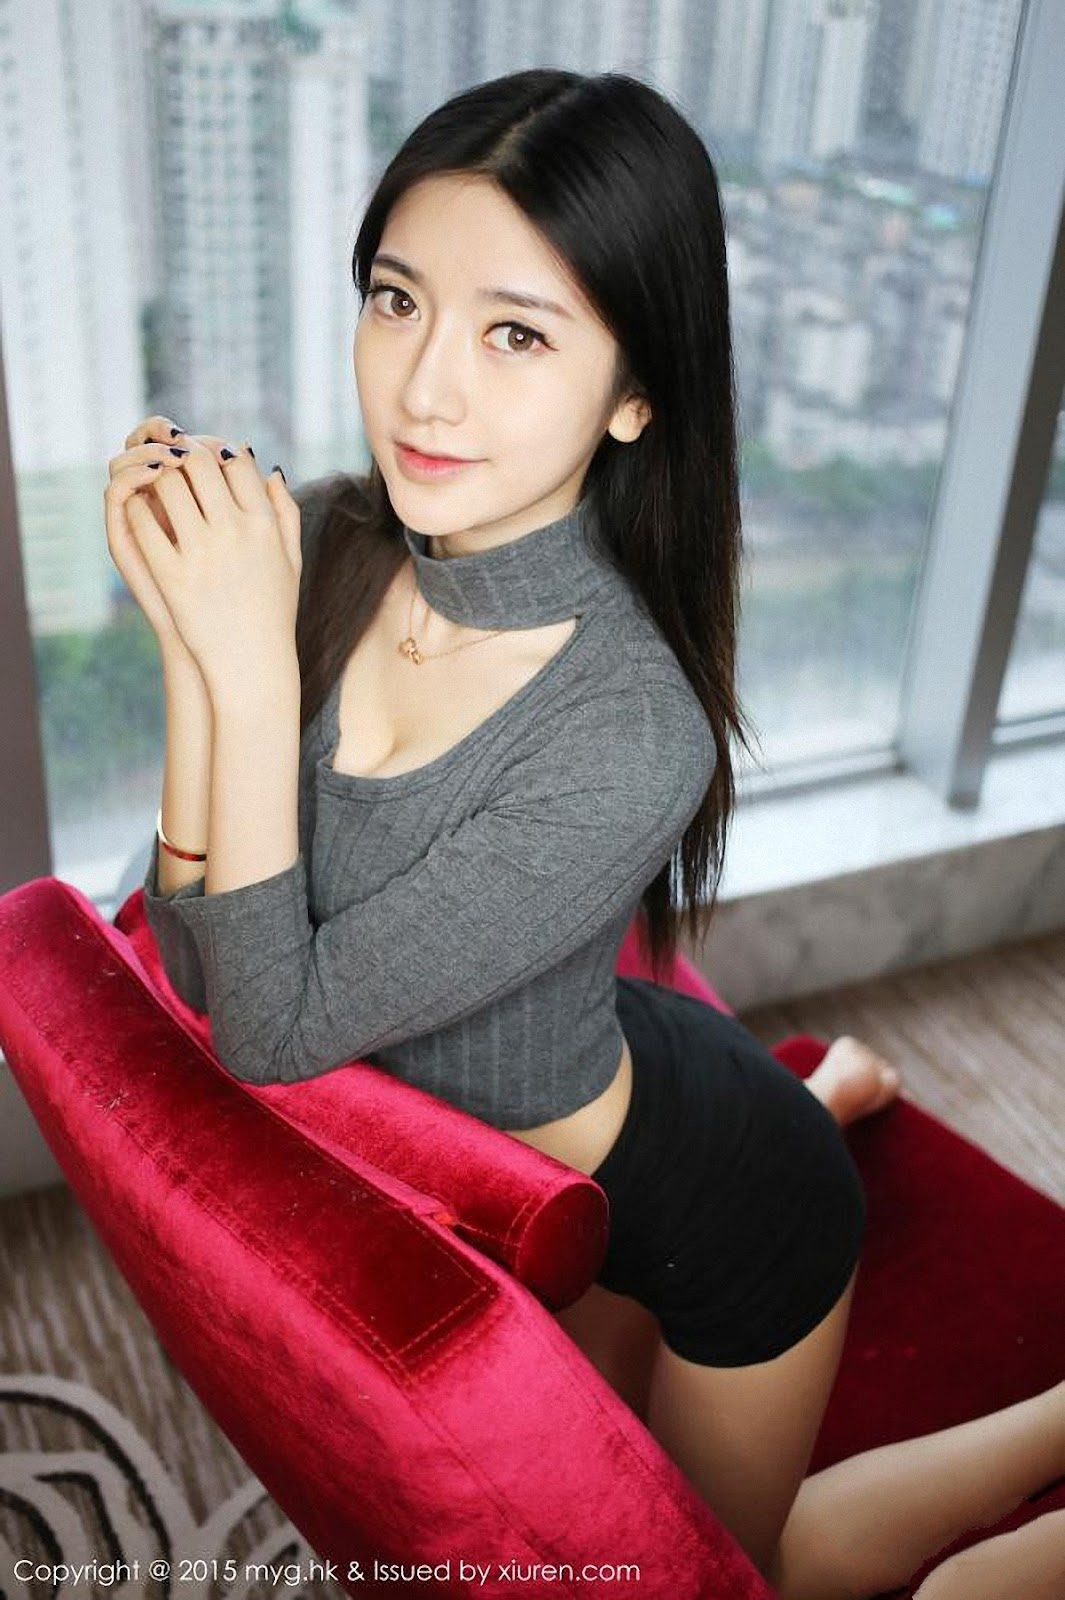 30 - Sexy Girl Model MYGIRL VOL.119